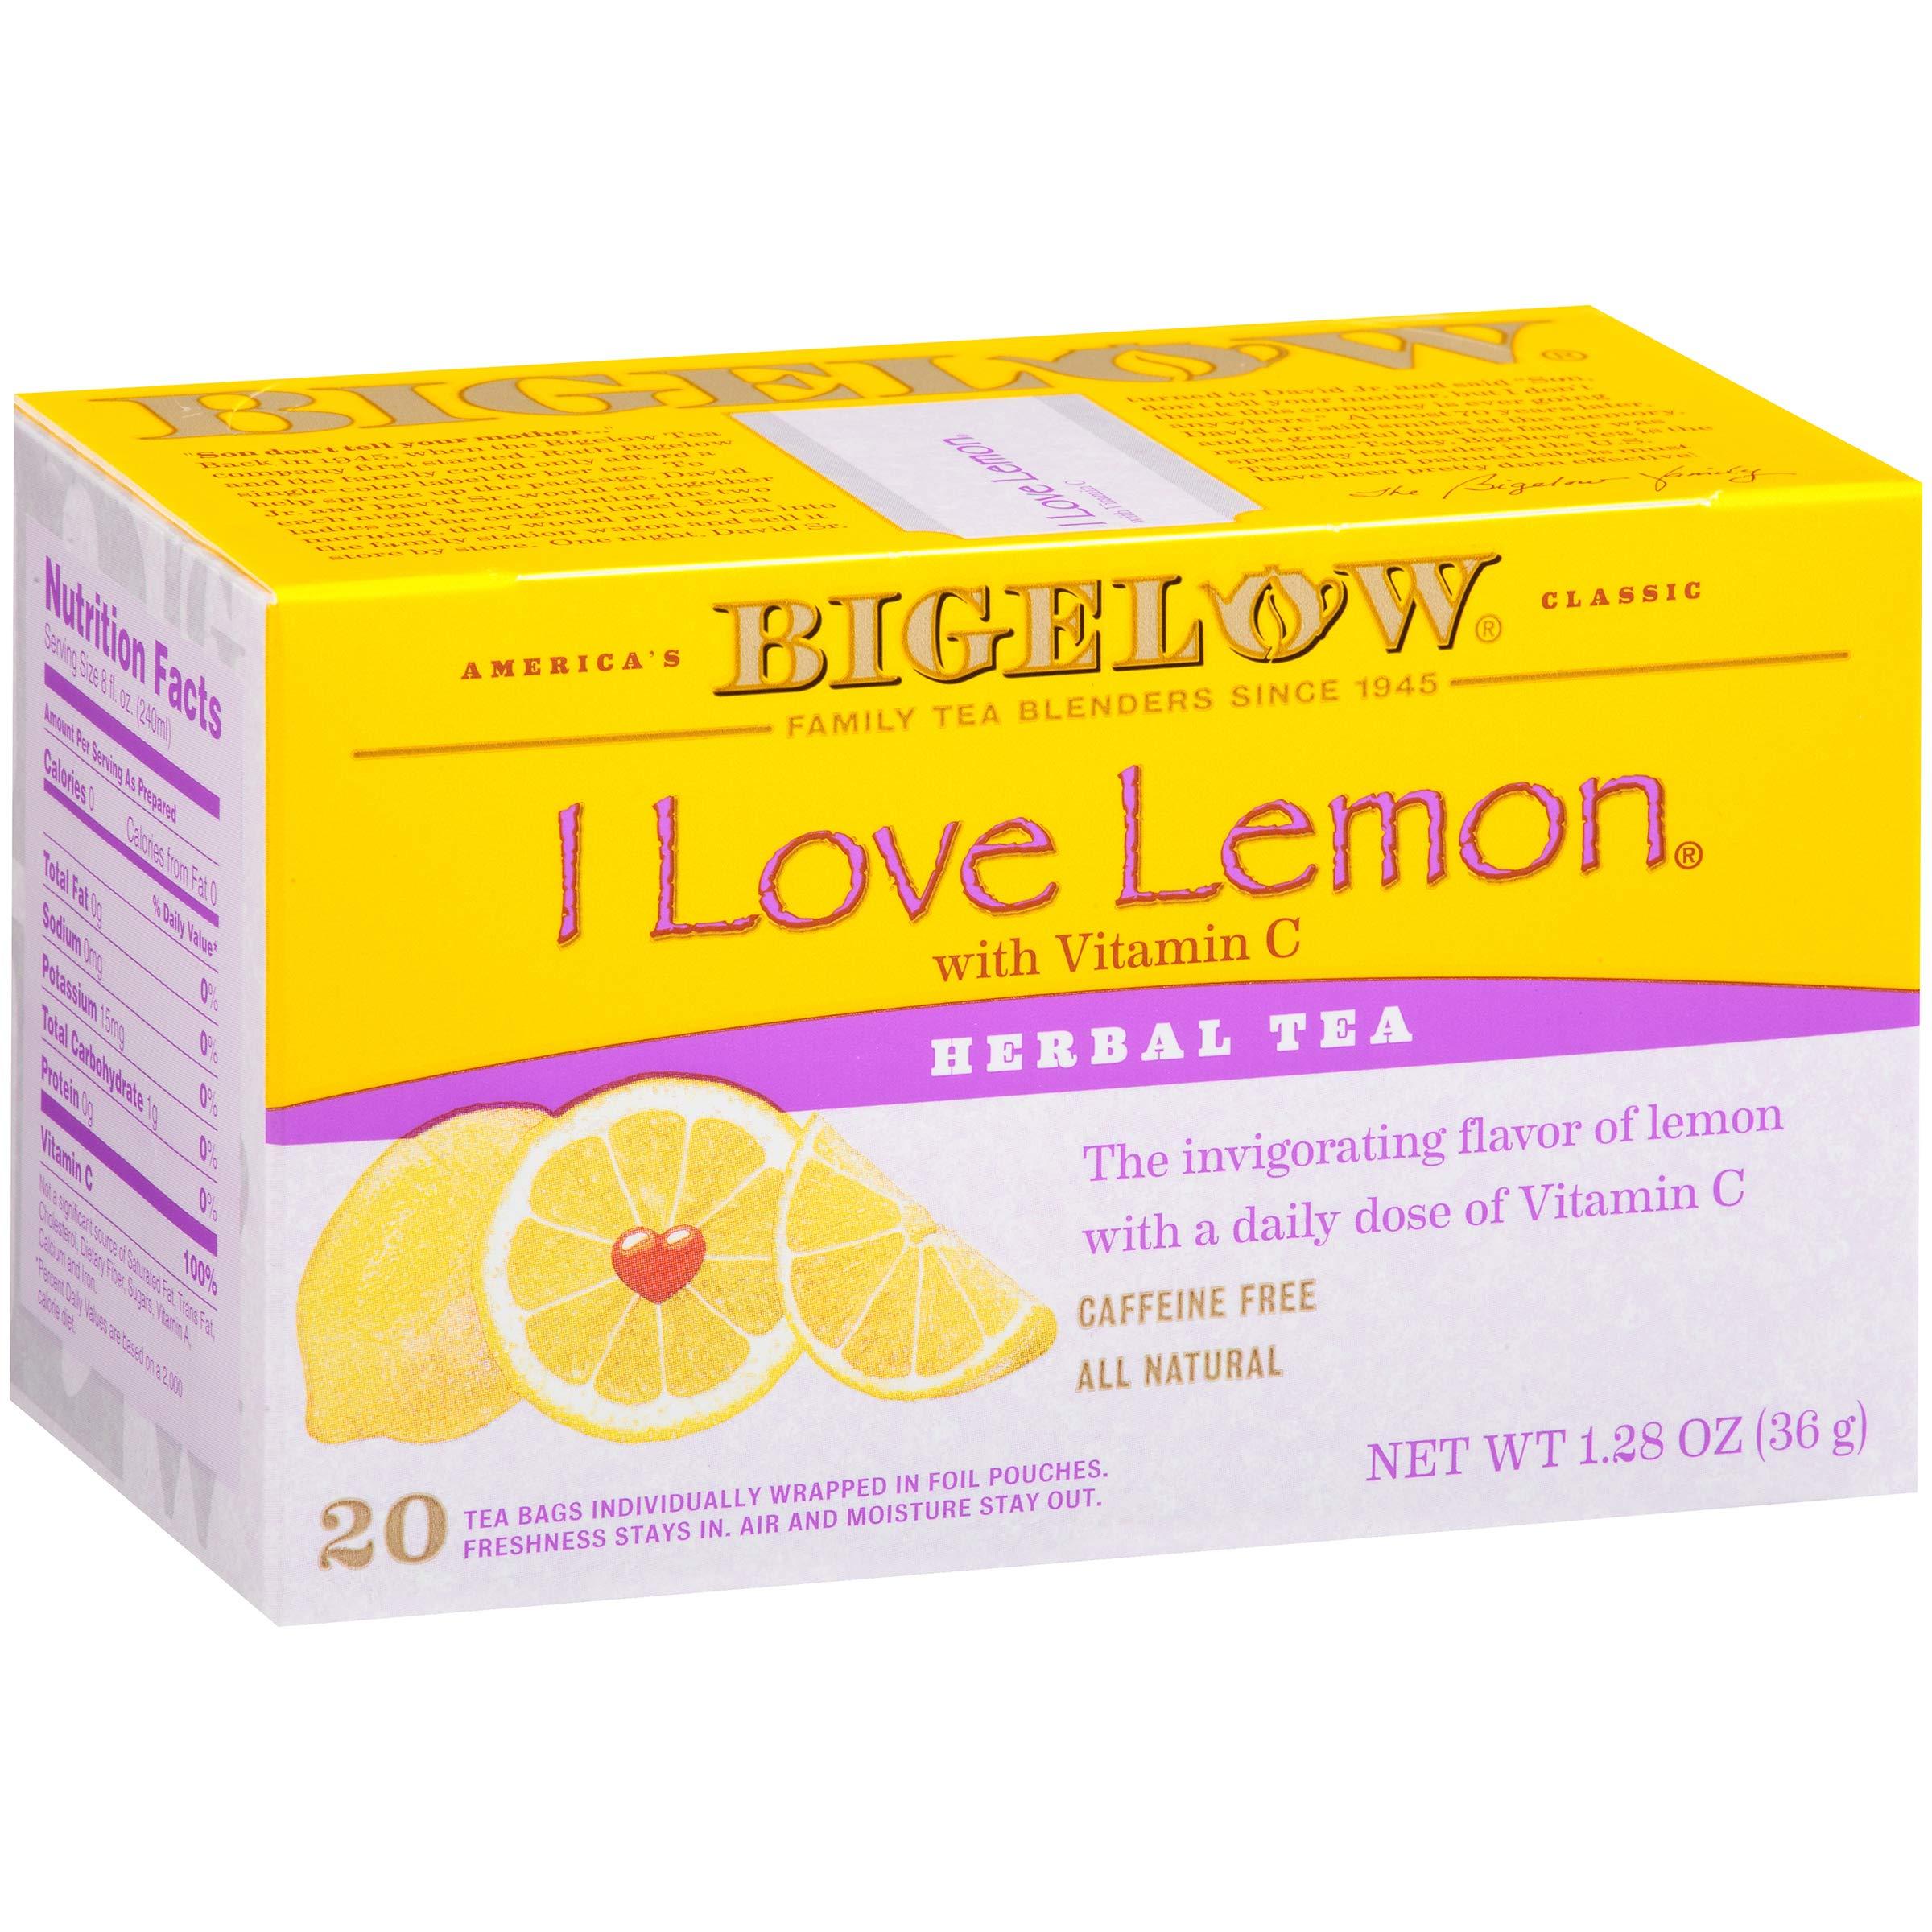 Bigelow I Love Lemon Herbal Tea Bags 20-Count Boxes (Pack of 6), 120 Tea Bags Total.  Caffeine-Free Individual Herbal Tisane Bags, for Hot Tea or Iced Tea, Drink Plain or Sweetened with Honey or Sugar by Bigelow